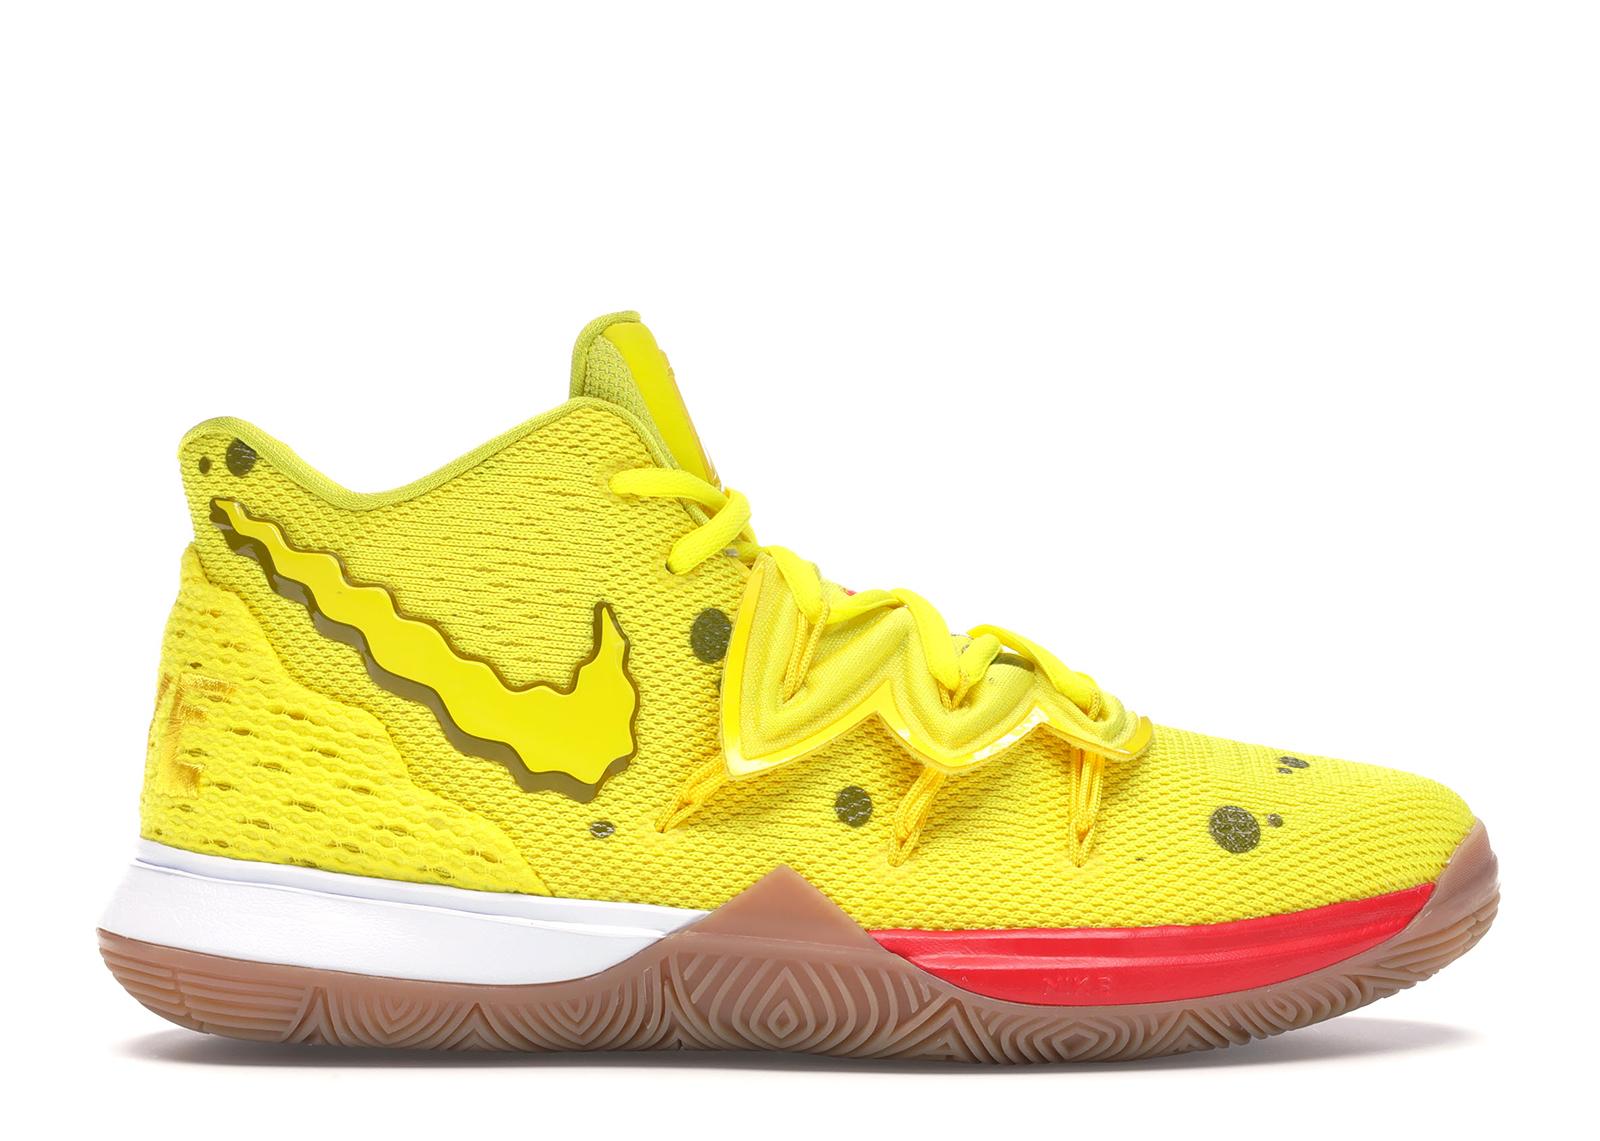 Nike Kyrie 5 Spongebob (GS) - CJ7227-700